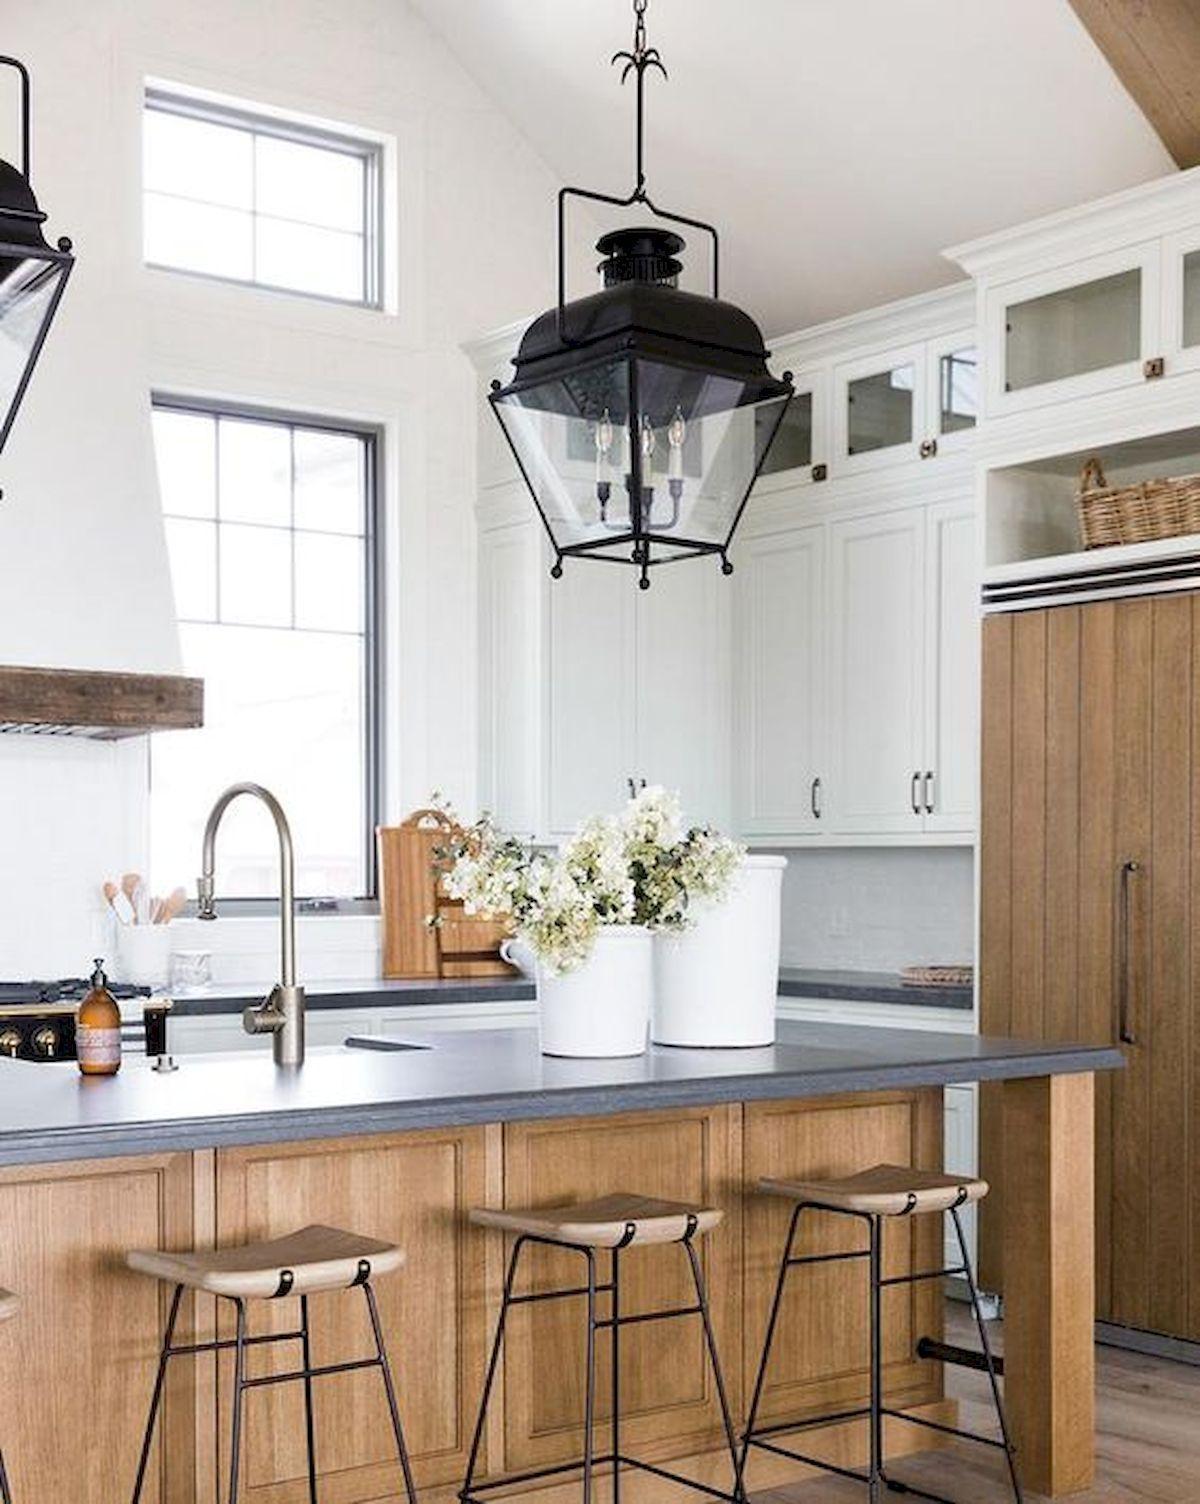 60 great farmhouse kitchen countertops design ideas and decor 13 kitchen design countertops on farmhouse kitchen decor countertop id=83289